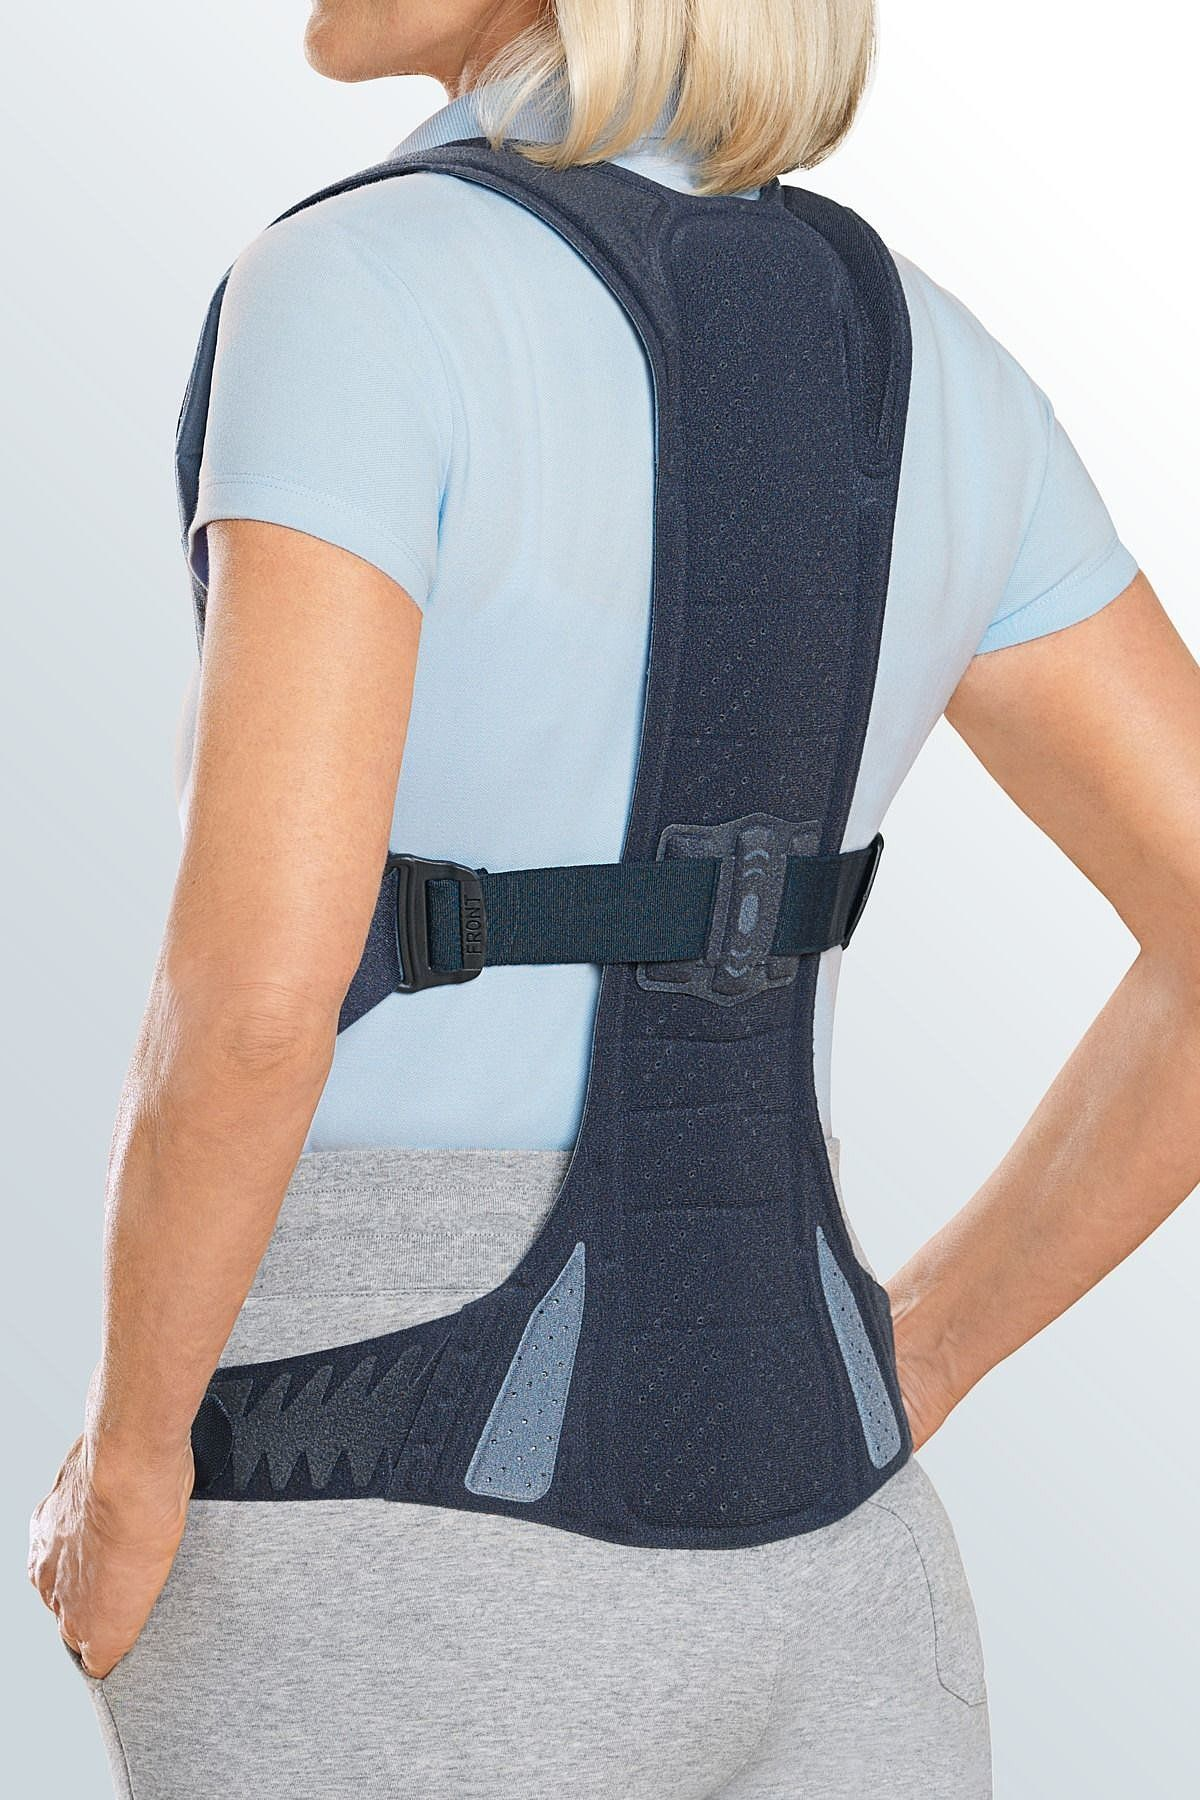 36+ Upper back brace for osteoporosis ideas